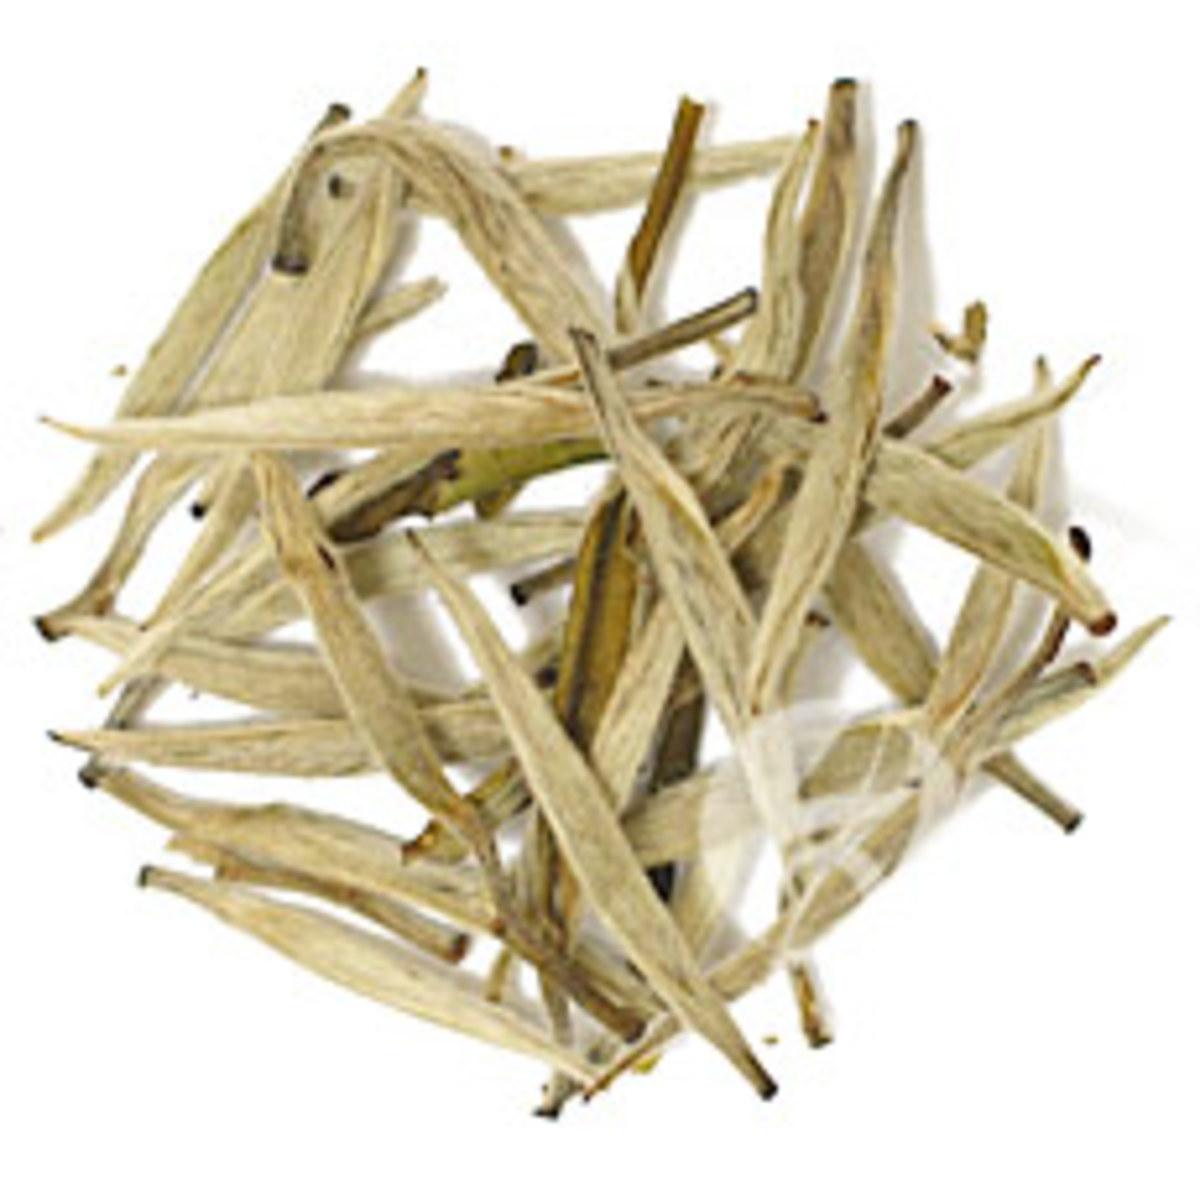 White Fur Silver Needle Tea Leaves